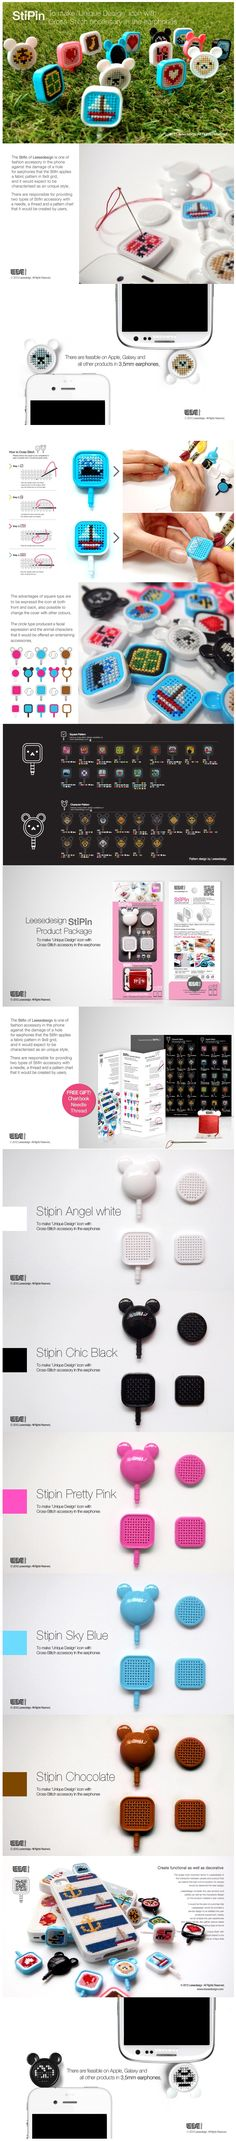 DIY cross stitch iphone case kit!